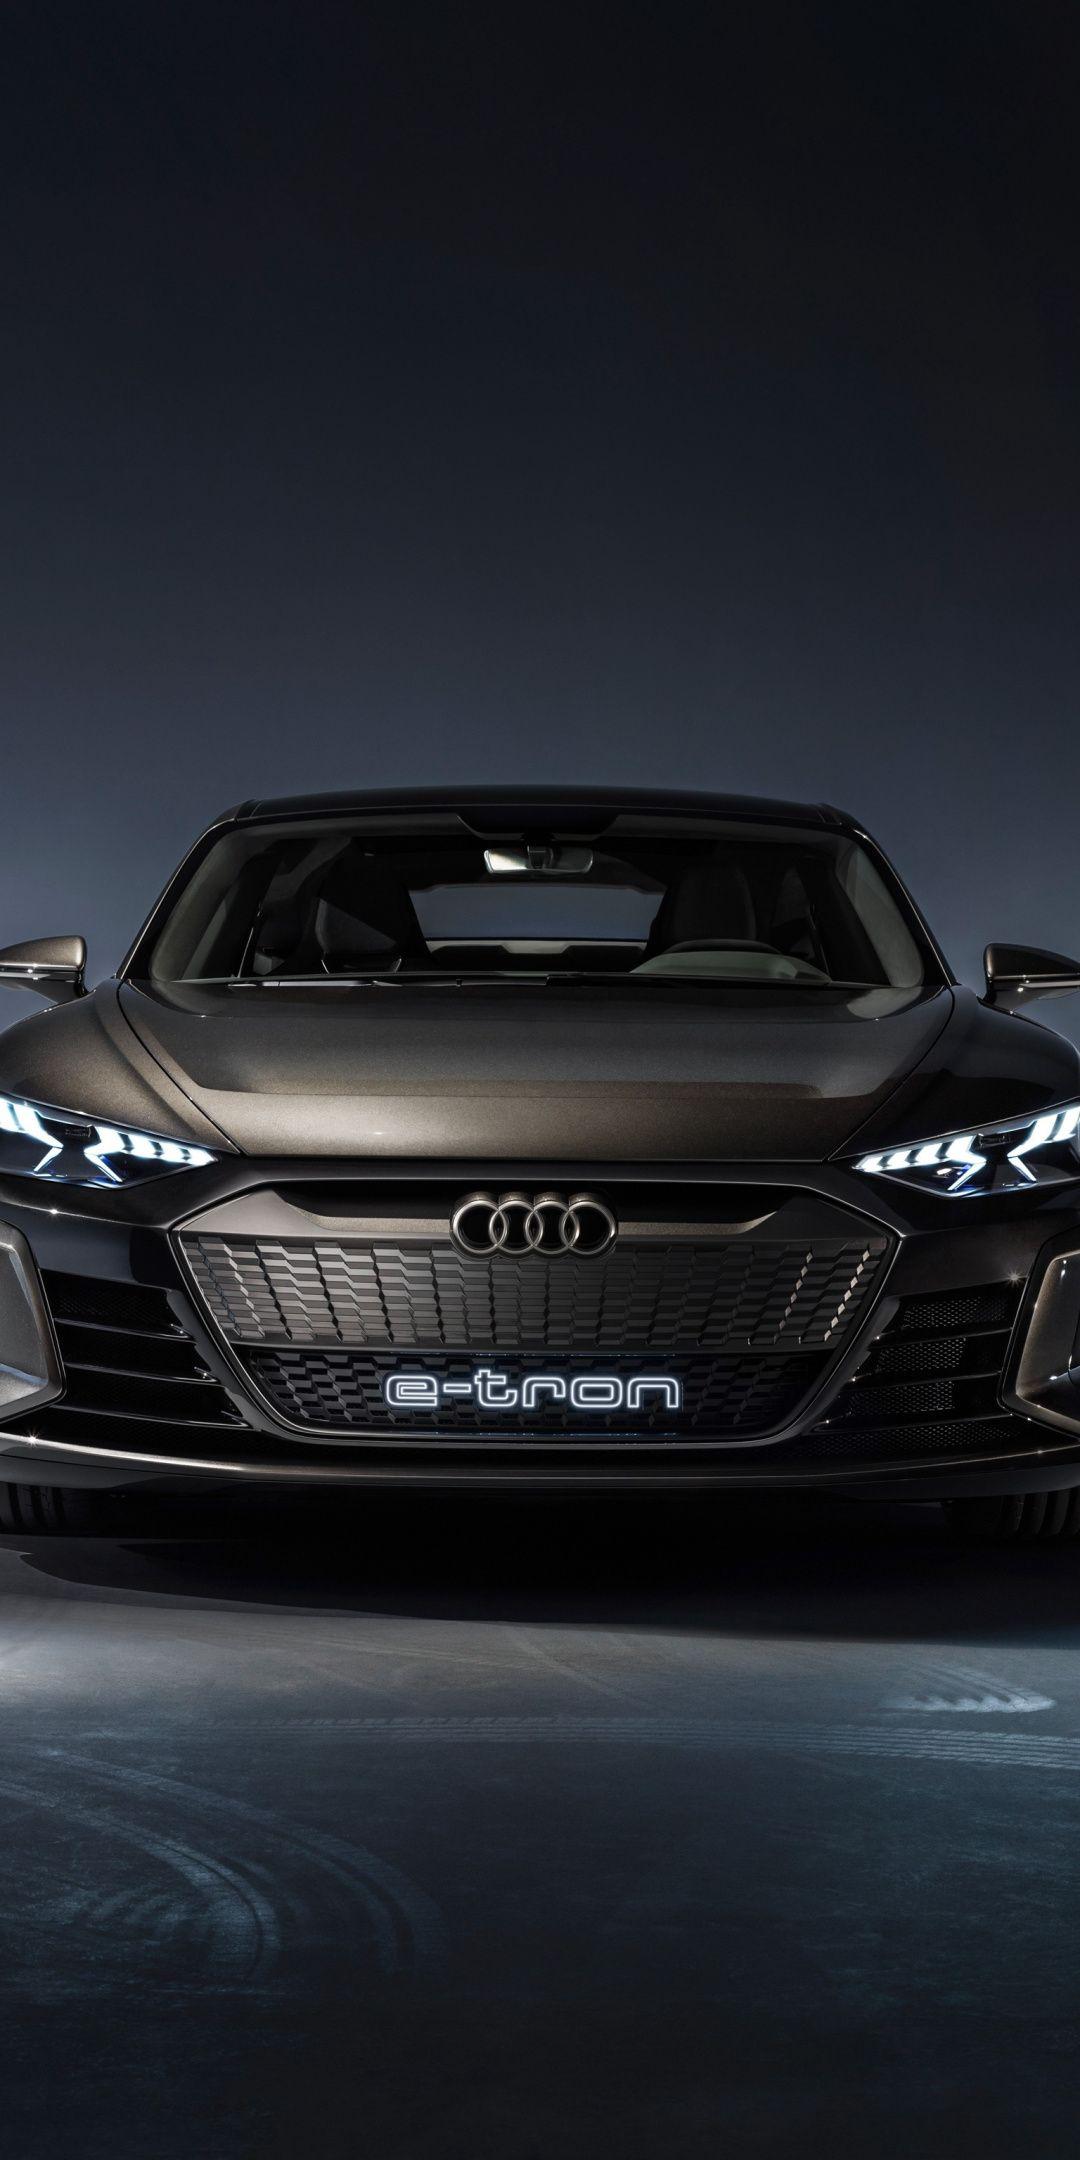 Audi E Tron Gt Concept Car 2019 1080x2160 Wallpaper Audi E Tron Car Wallpapers Audi